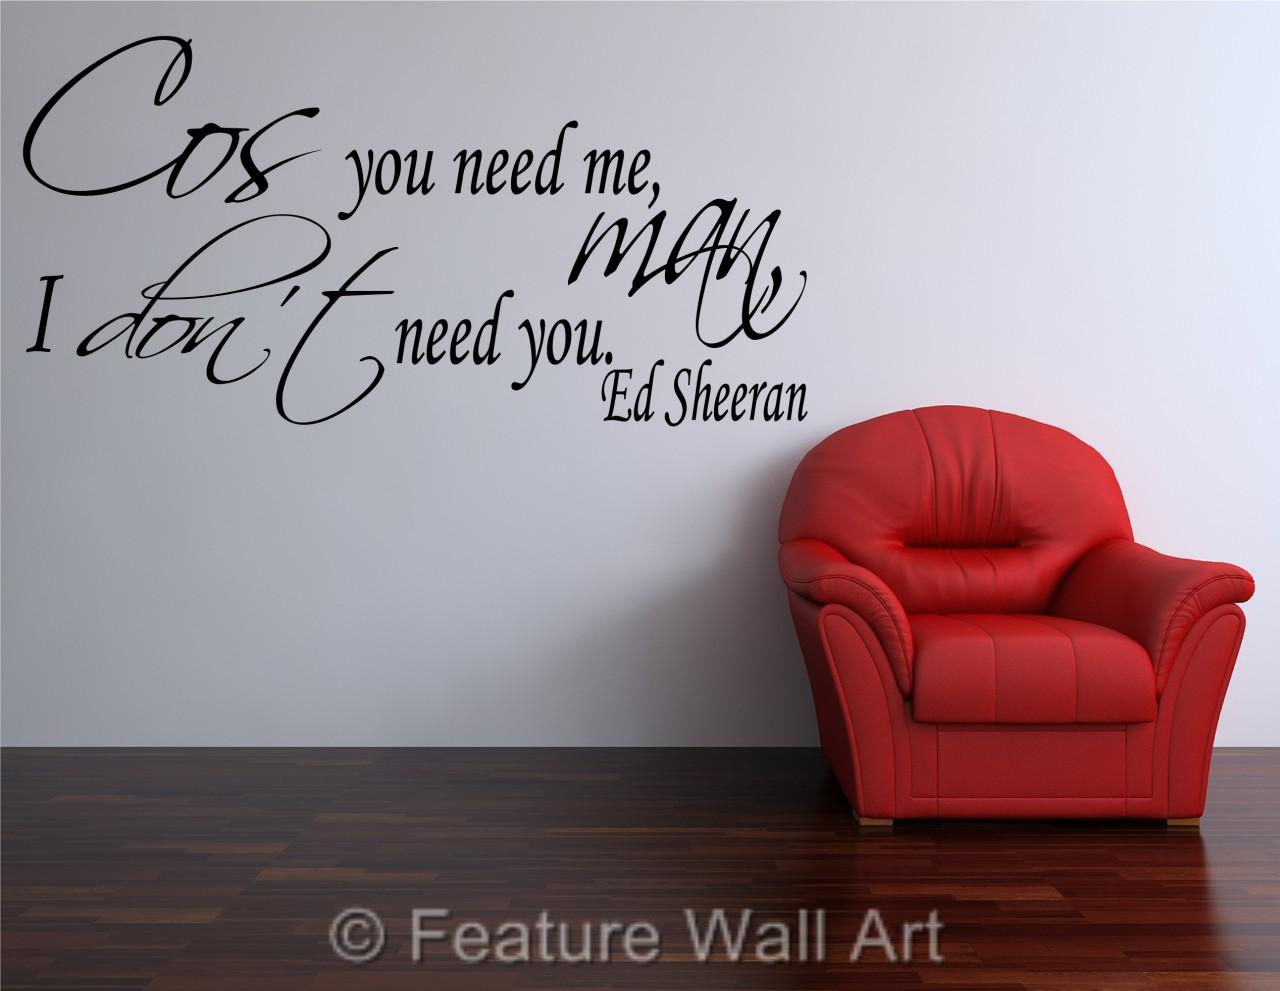 Wall Art Stickers Ed Sheeran : Ed sheeran you need me i don t lyrics wall art